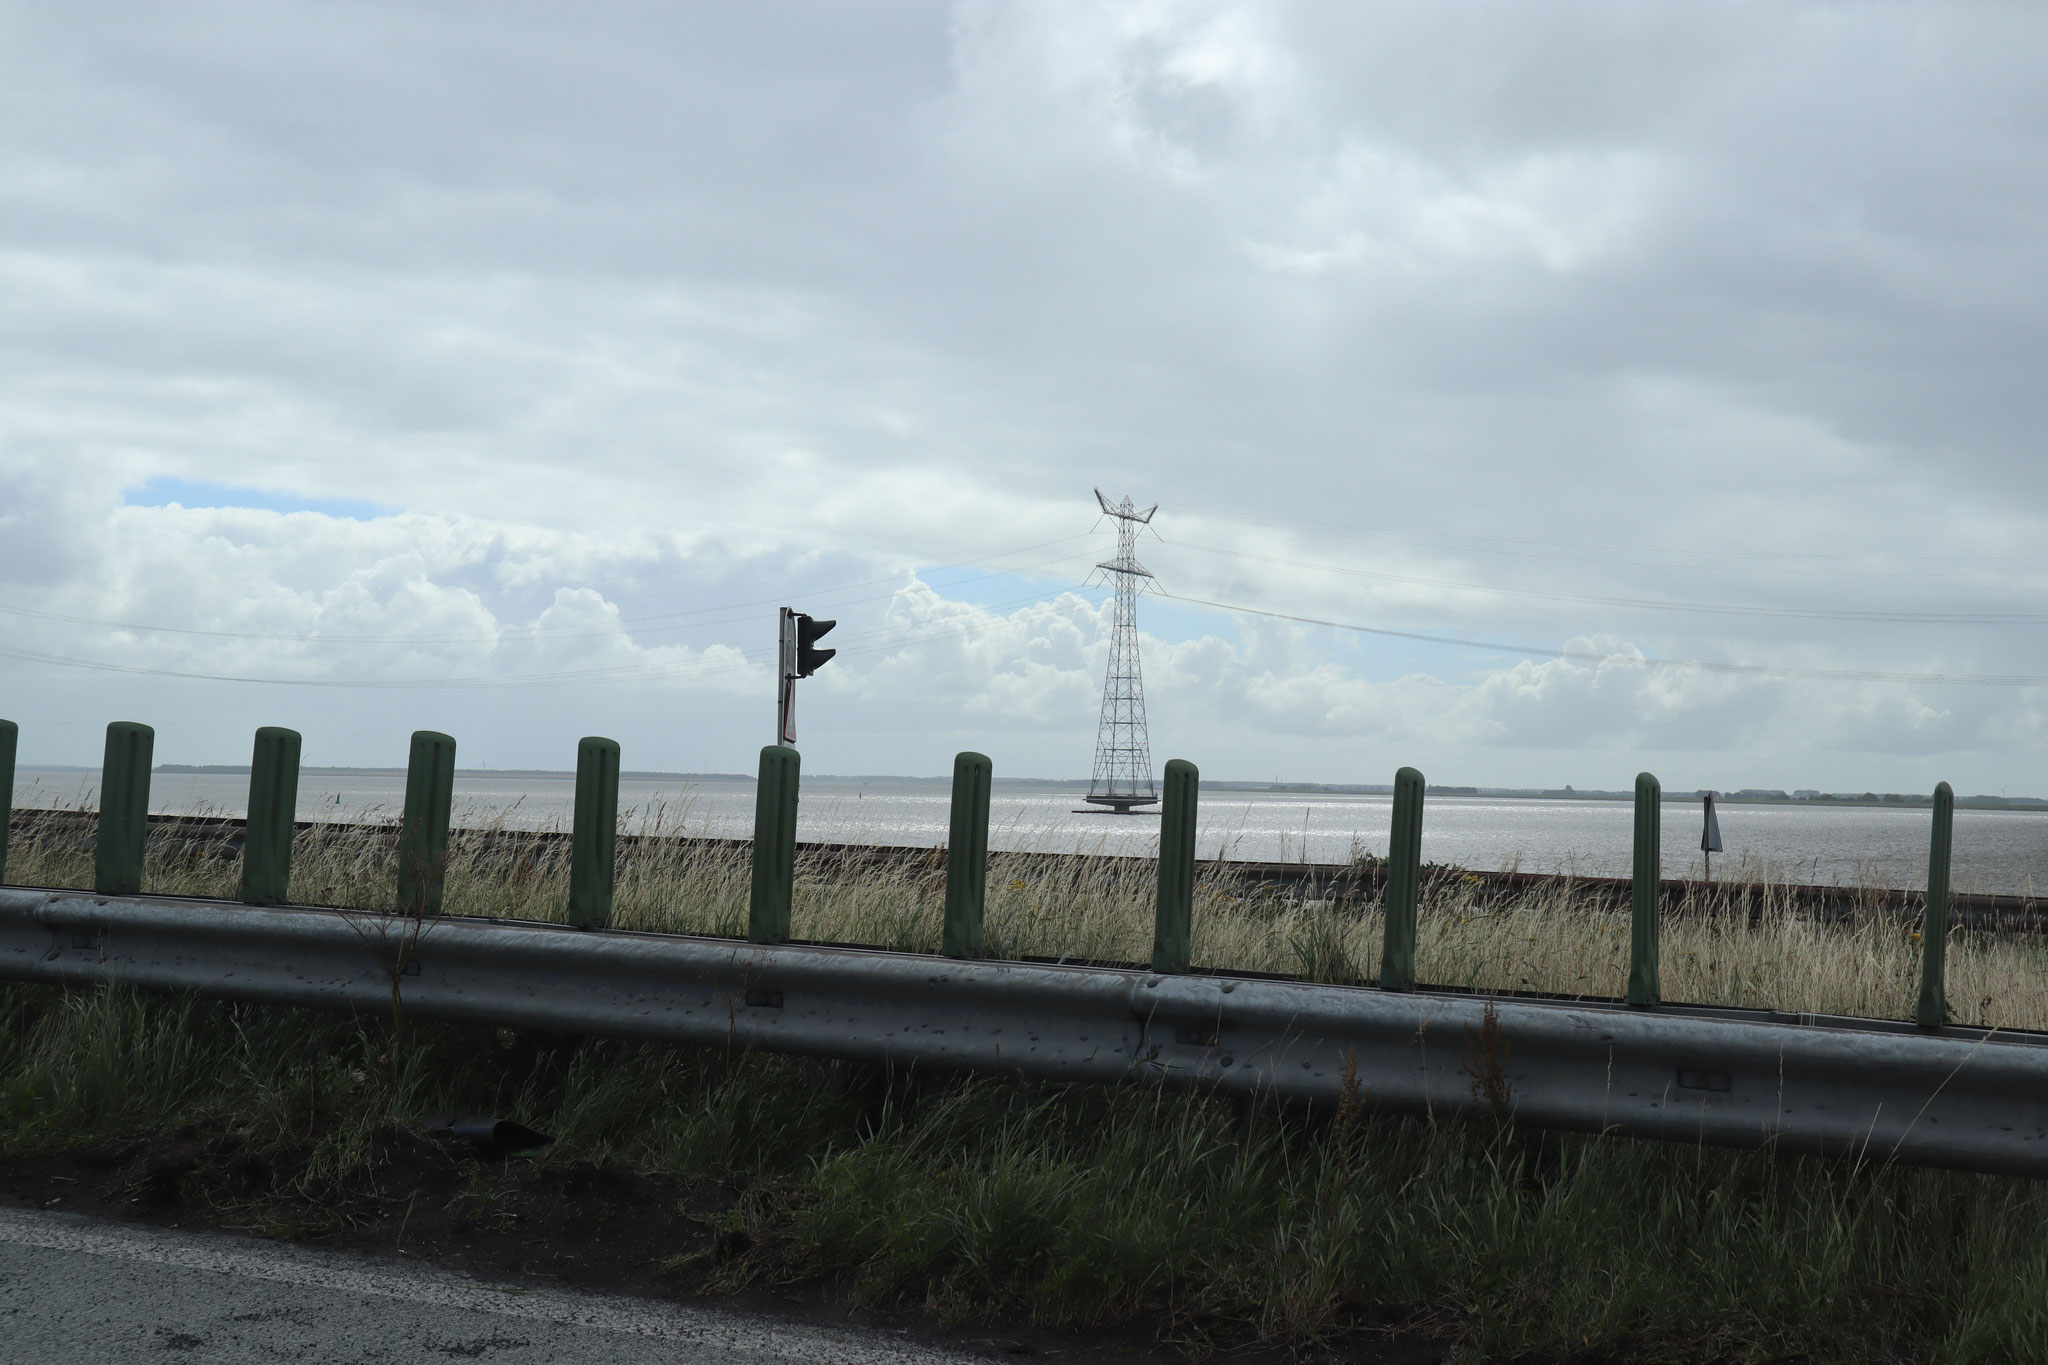 Giethoorn(ヒートホールン)アルバム アムステルダムから北へ